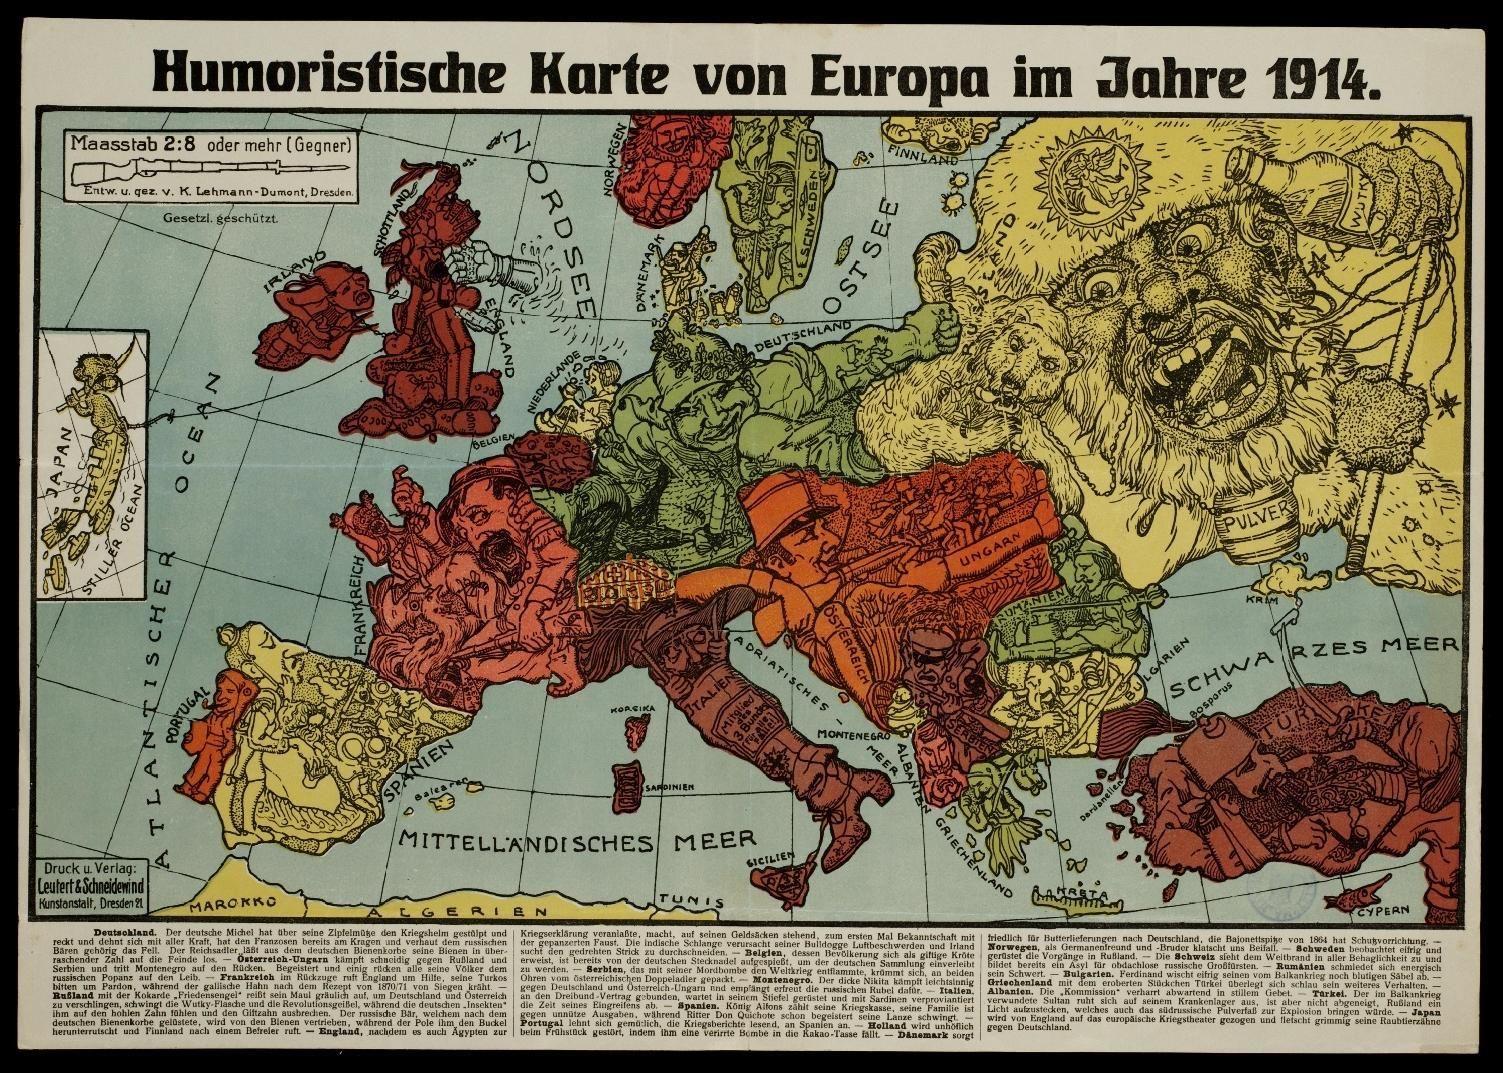 Explore Europe 1914 European History and more